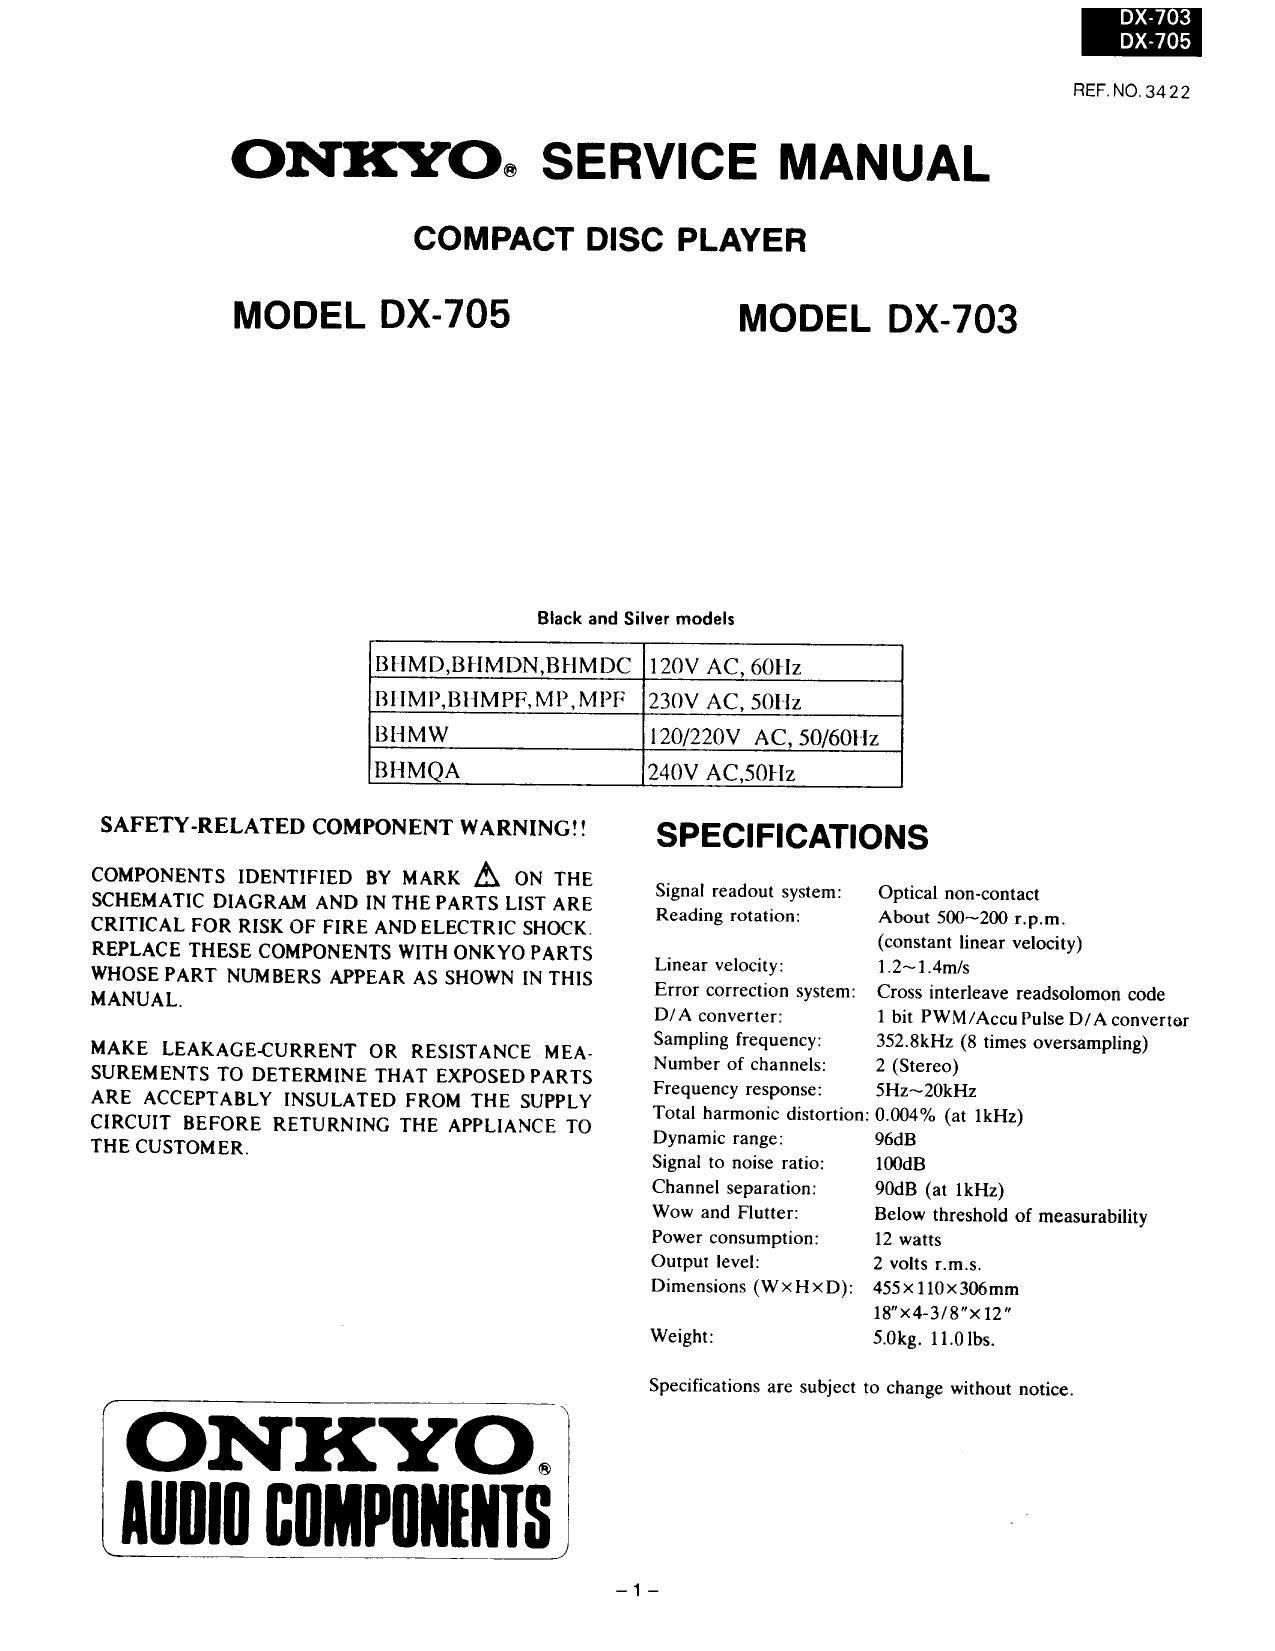 onkyo dx 705 service manual rh audioservicemanuals com